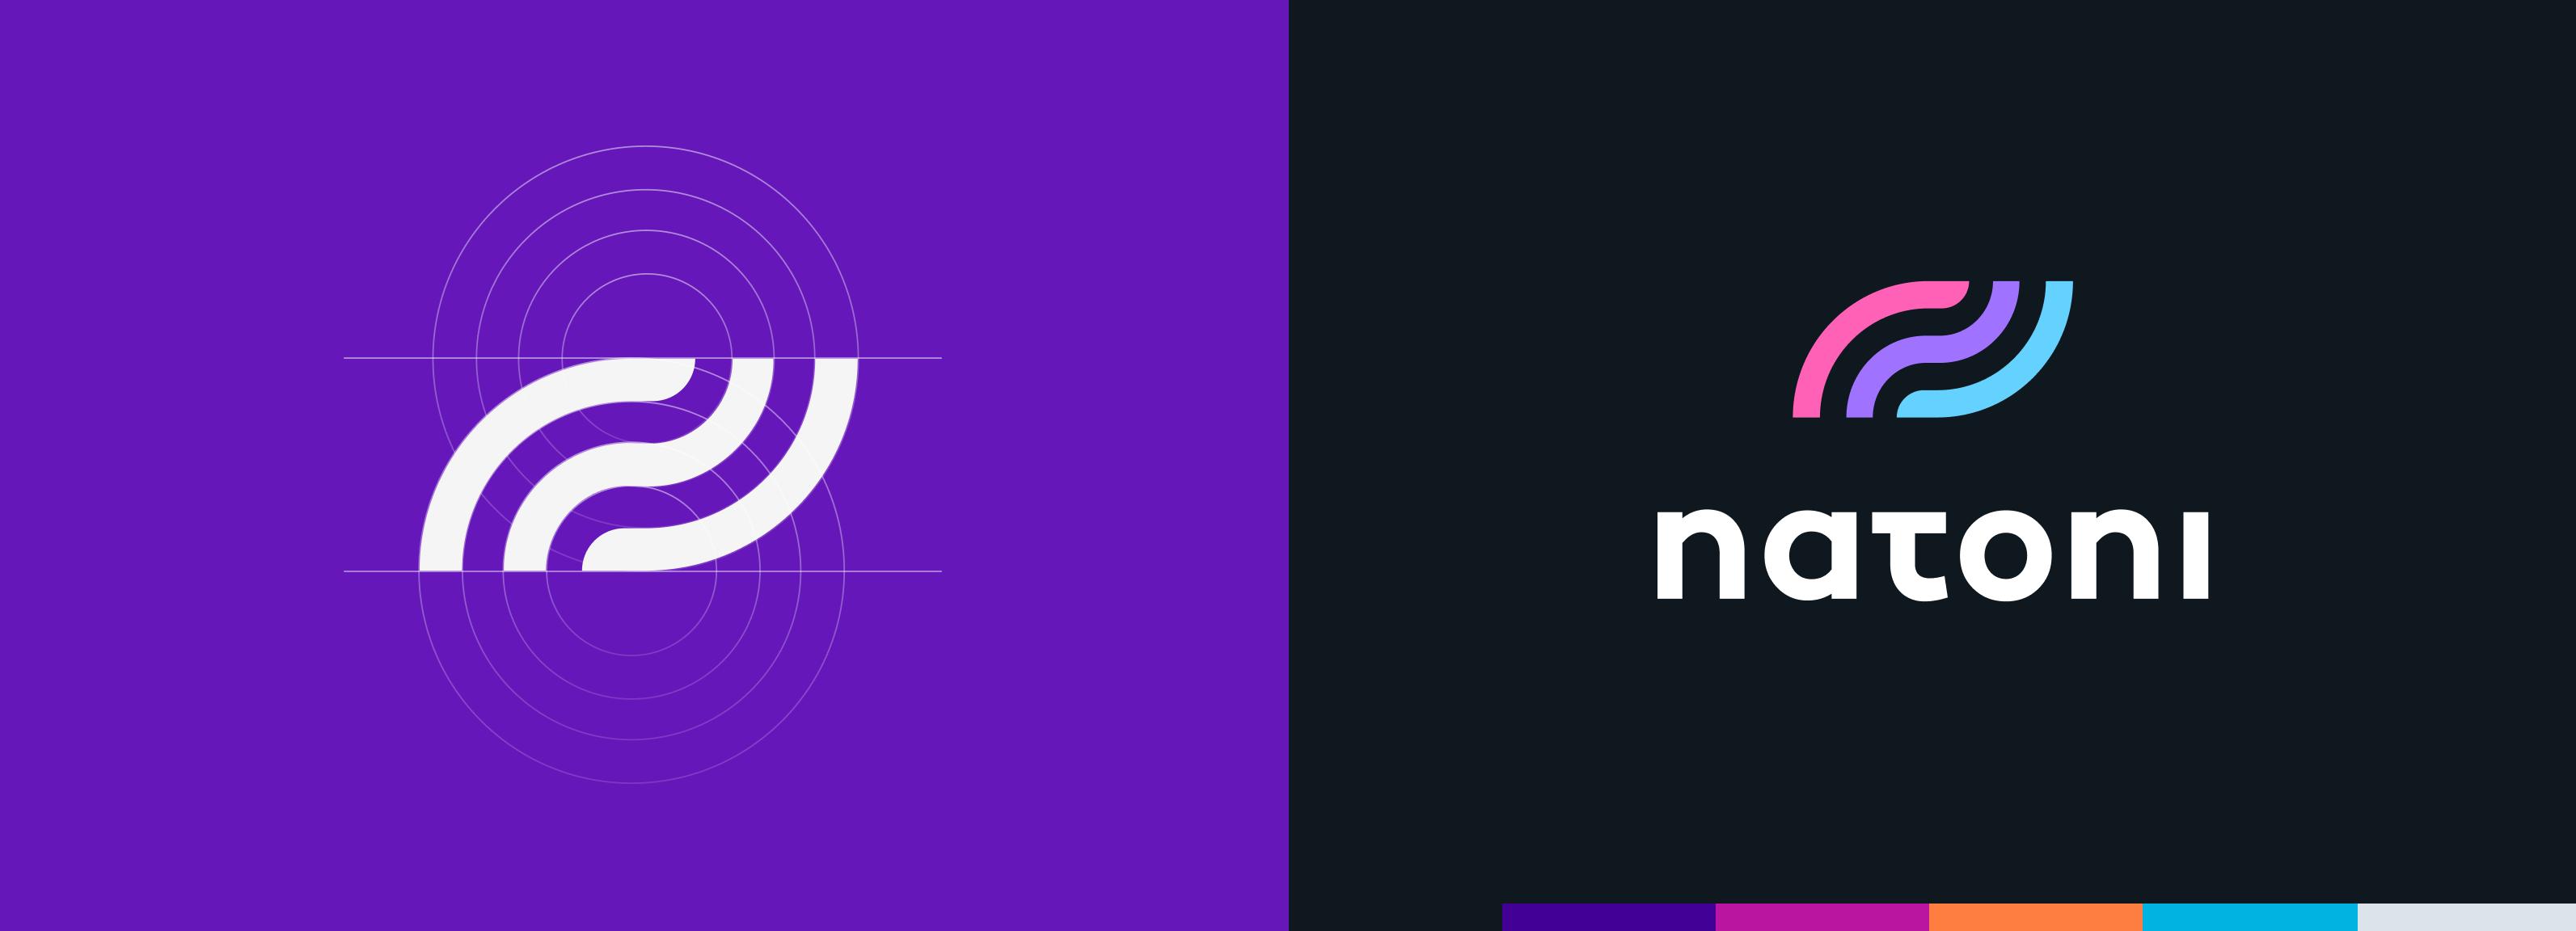 logo complete natoni